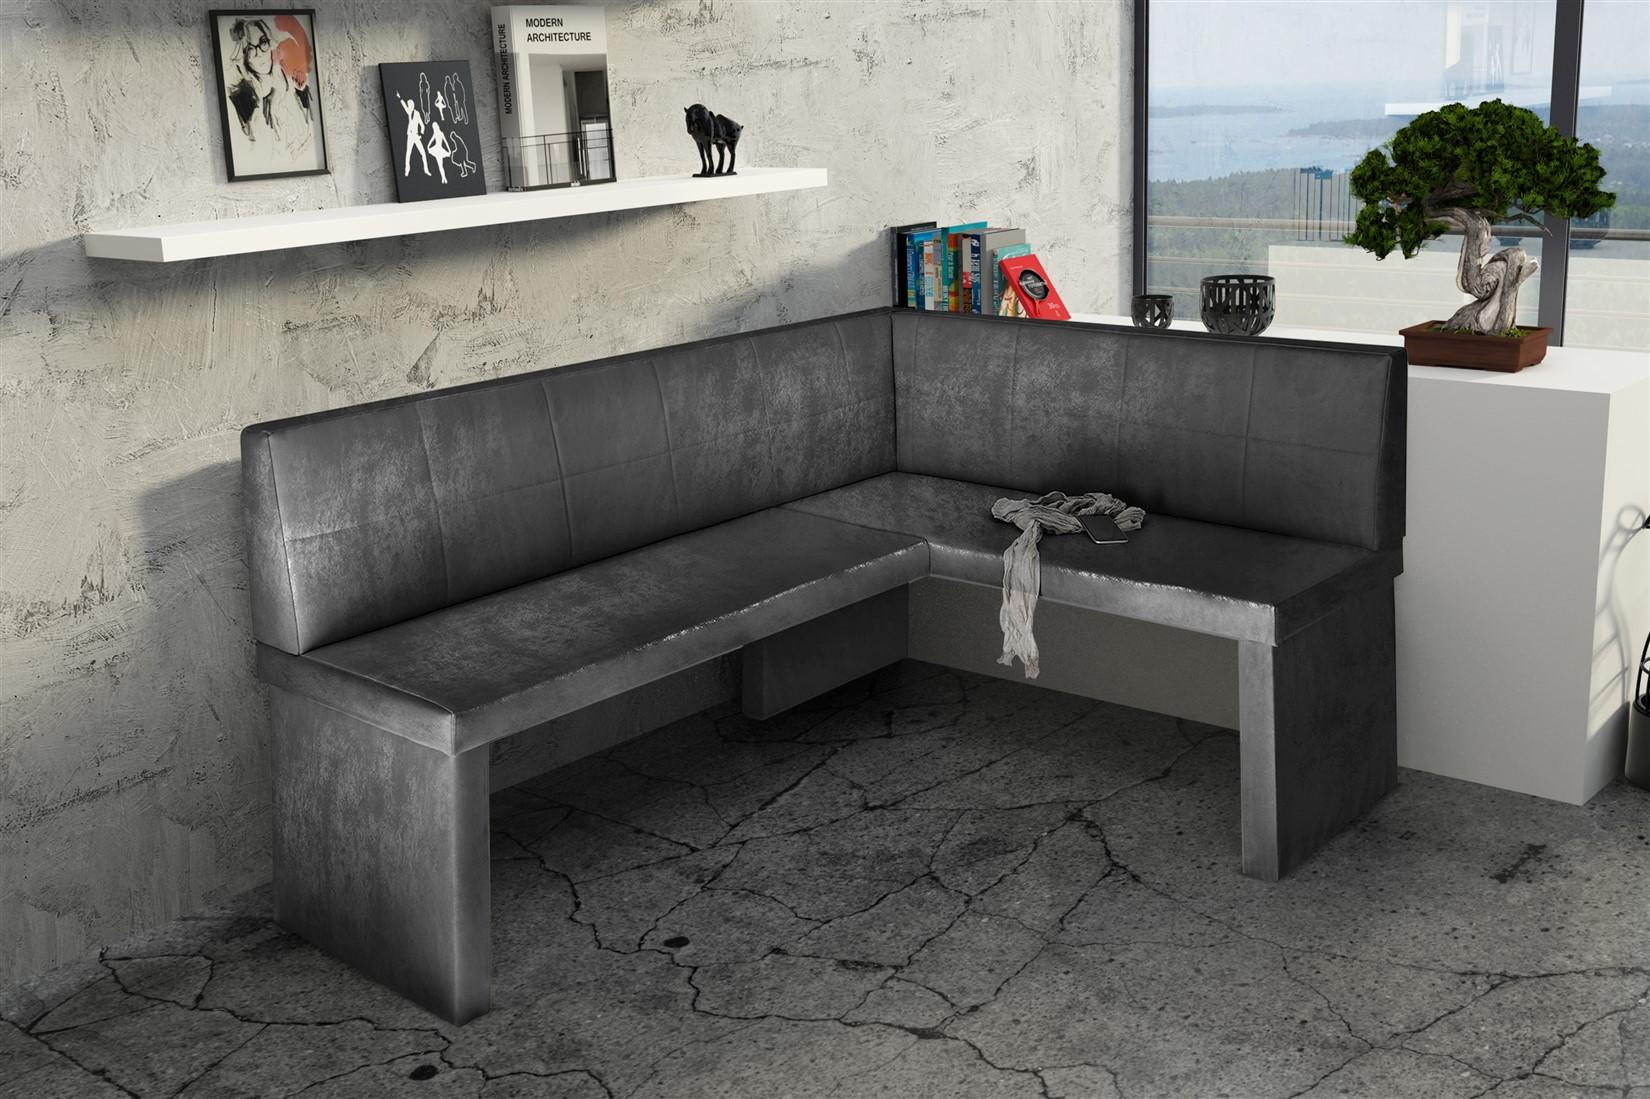 bankkissen sitzkissen klemmkissen doris 2er set. Black Bedroom Furniture Sets. Home Design Ideas